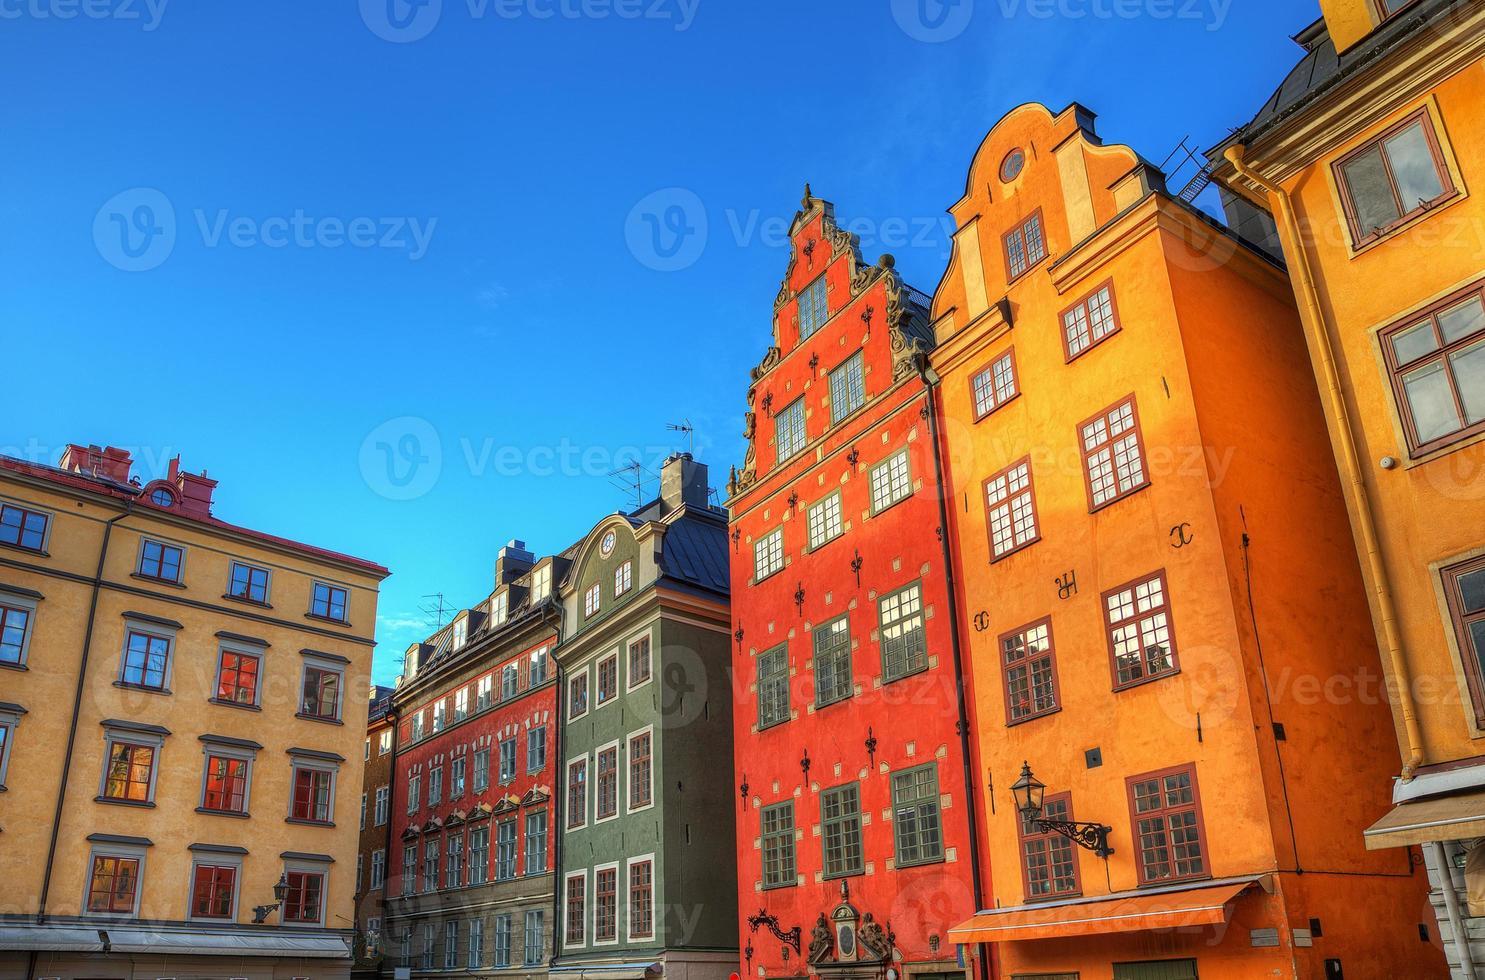 stortorget gamla stan stockholm, hdr image.e. photo